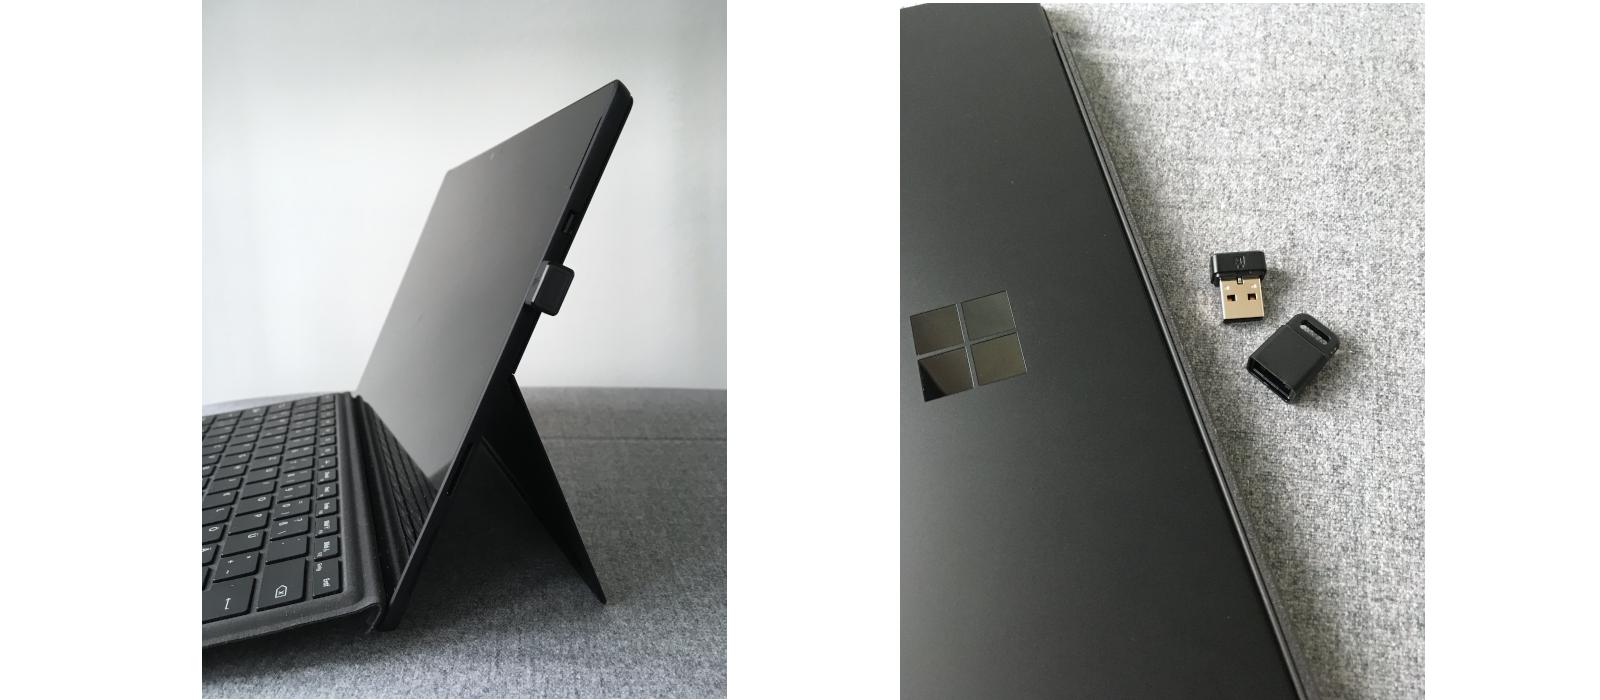 "The Kensington® VeriMark™ Fingerprint Scanner ""Designed for Surface"" with the Surface Pro 6"